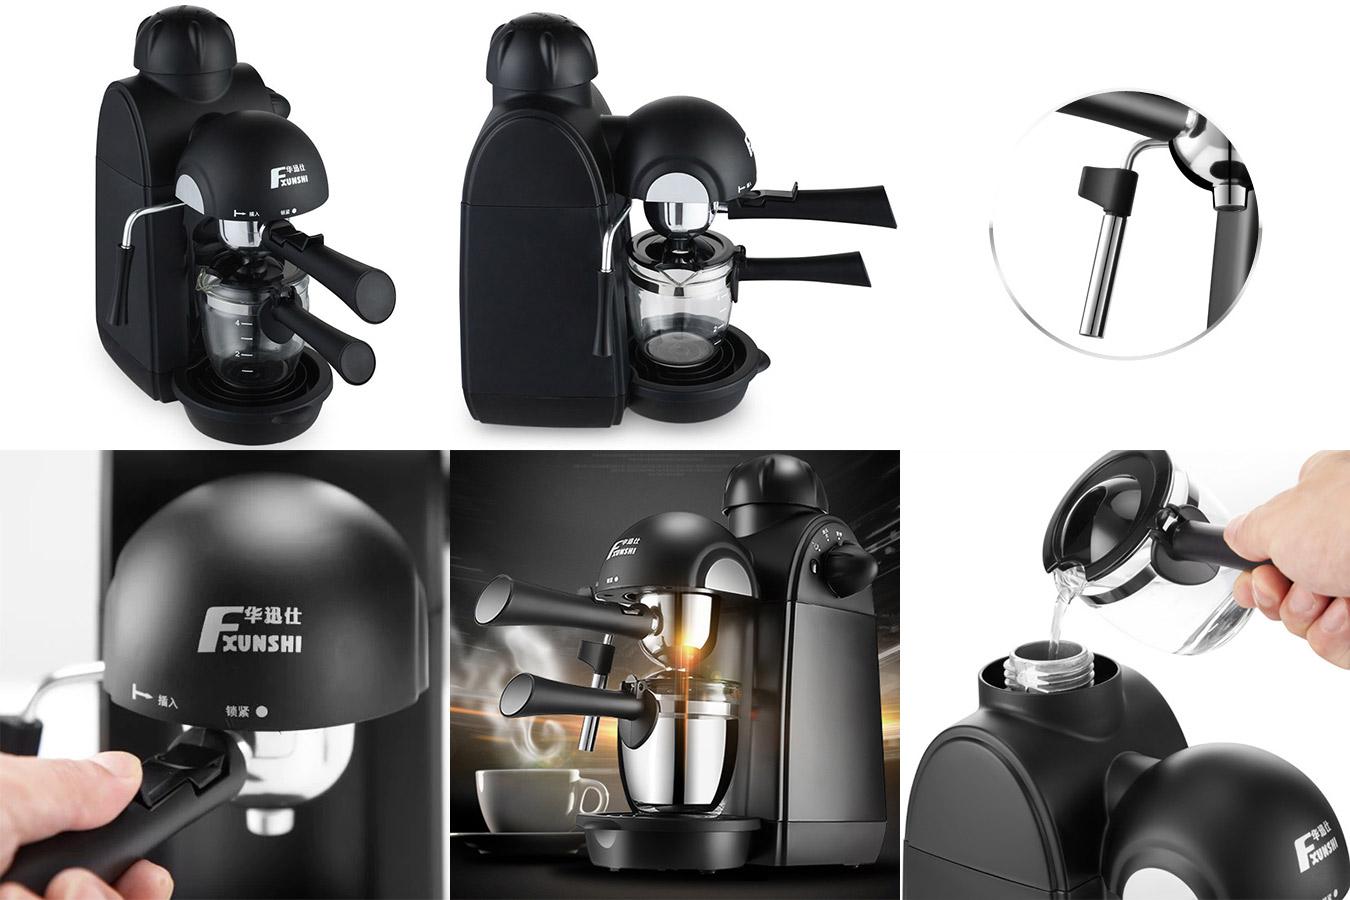 Кофеварка с алиэкспресс